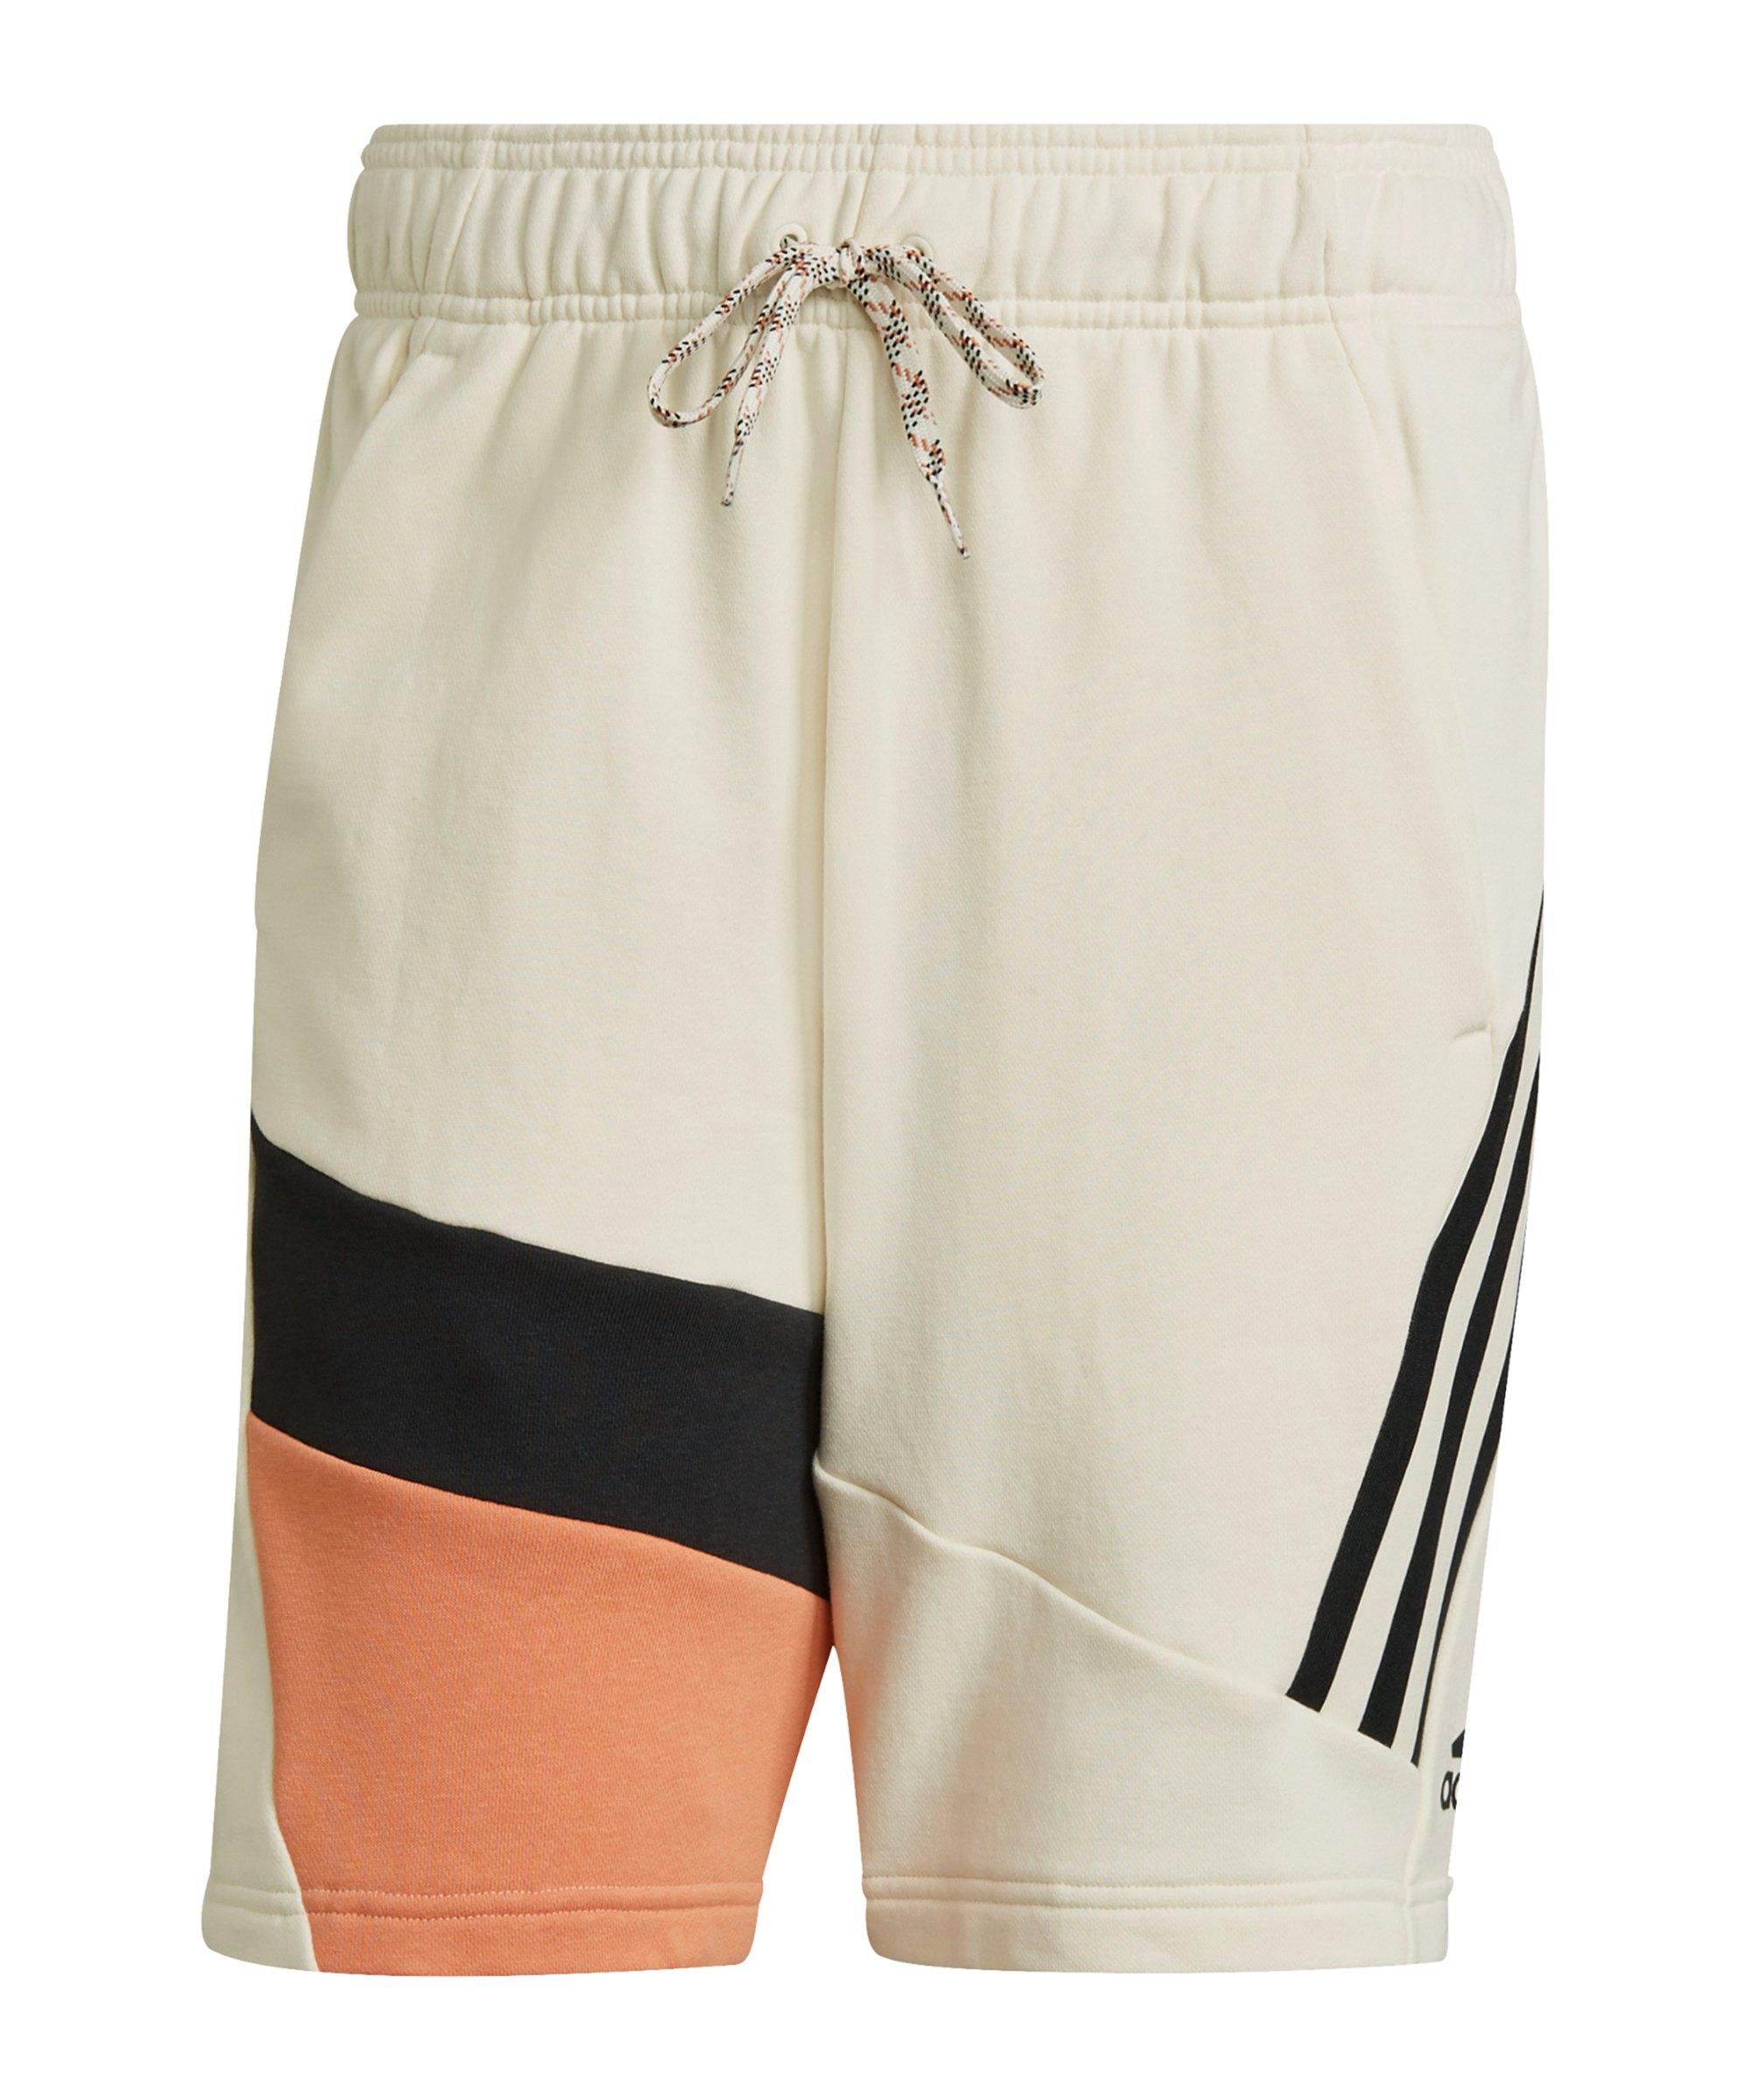 adidas 3 Stripes Tape Summer Short Weiss Orange - weiss